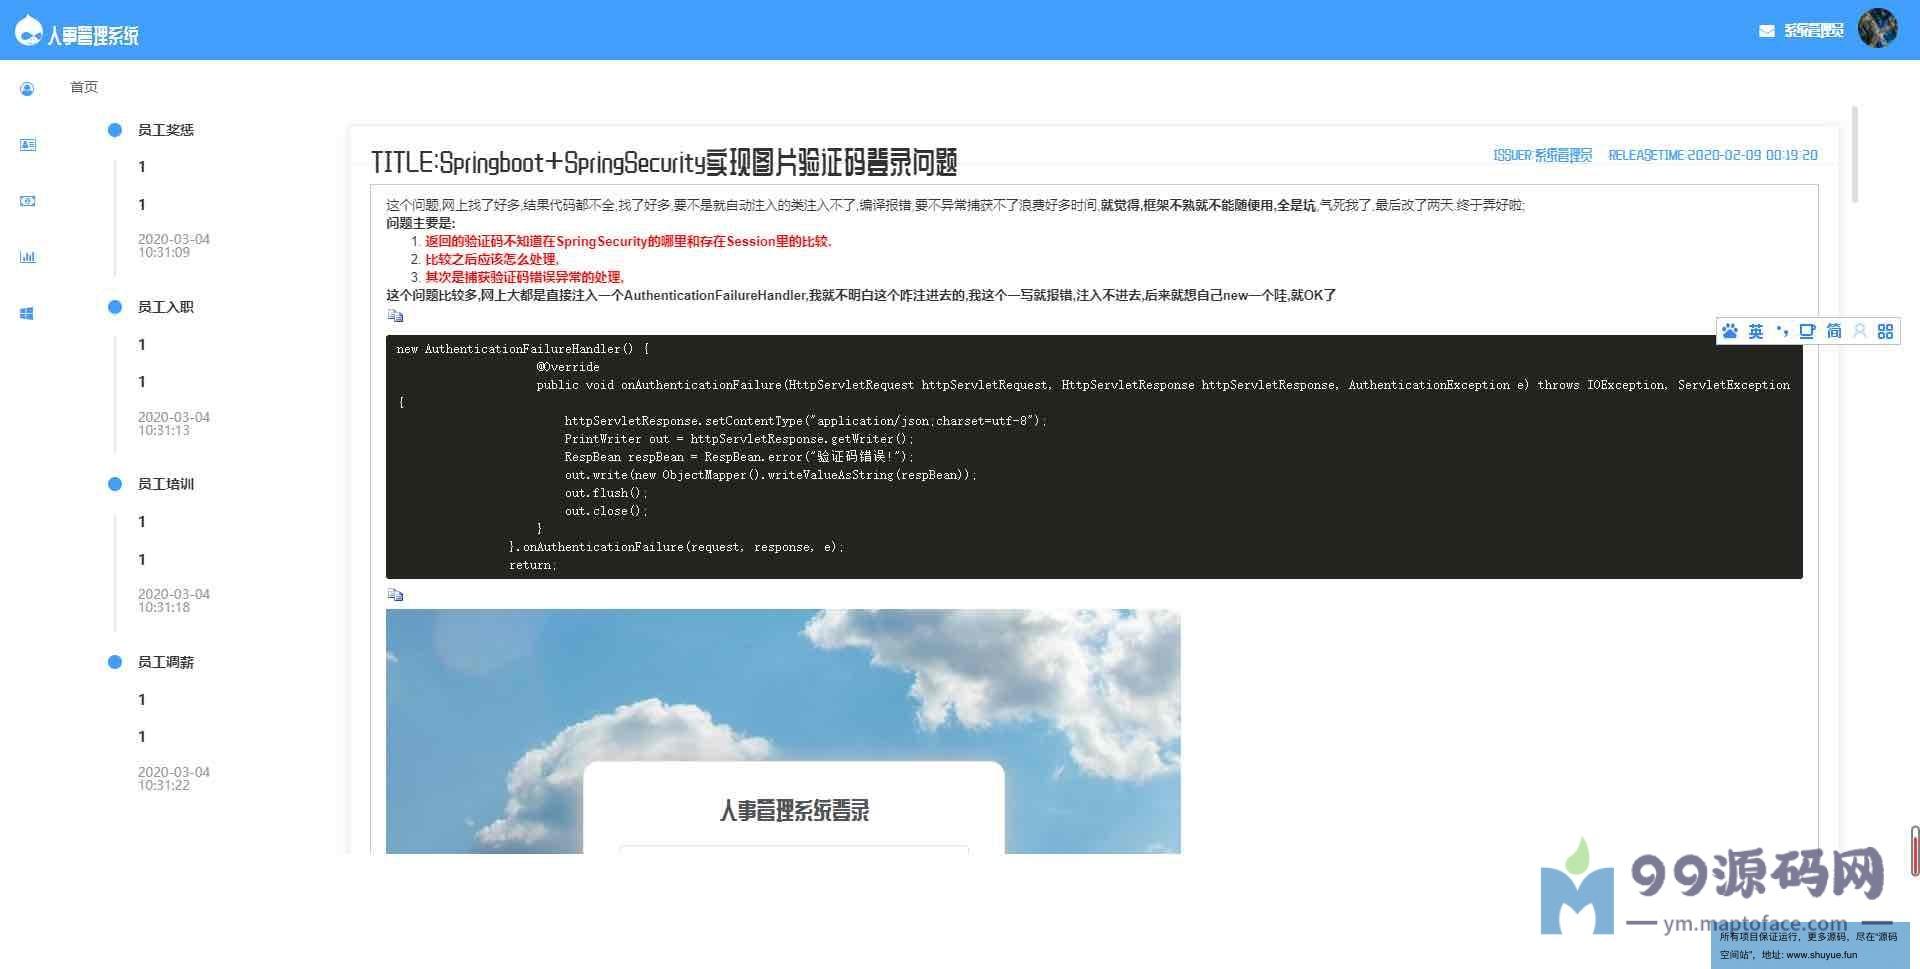 springboot企业人事系统(含论文)、